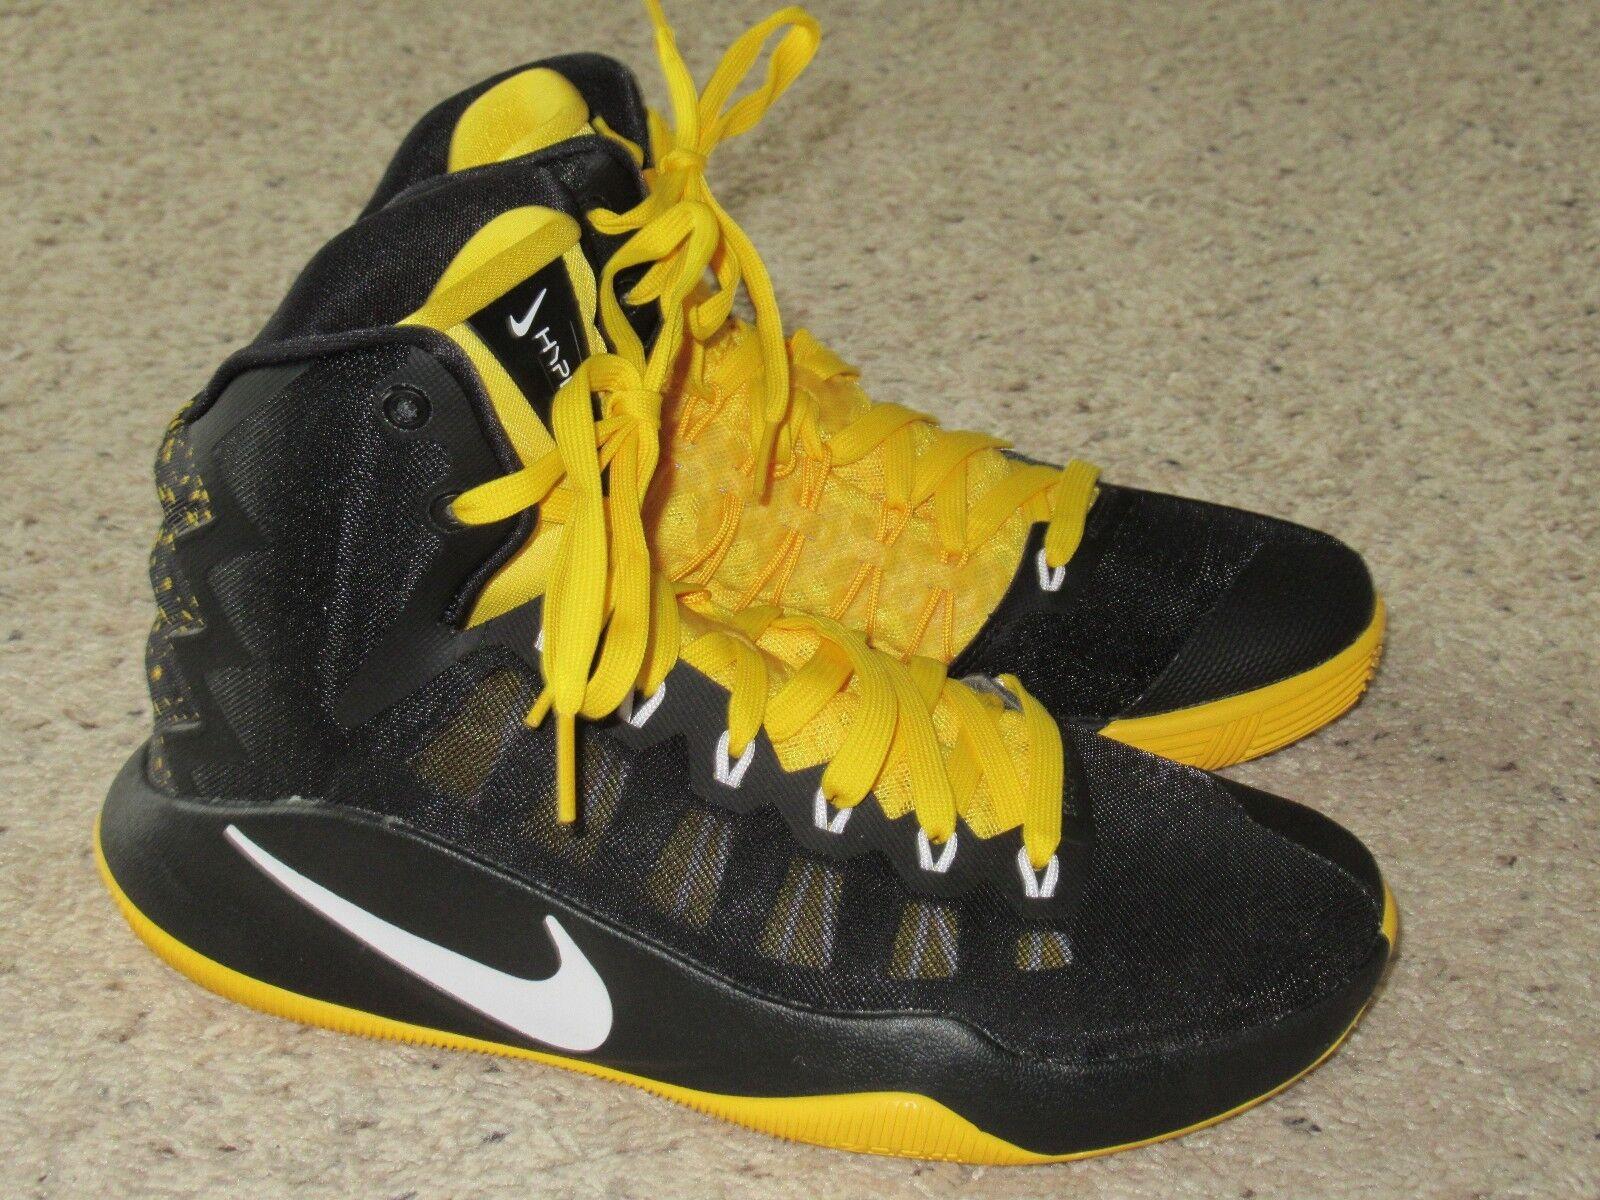 Nike Zoom Hyperdunk Mens Basketball Sneakers Shoes Black Yellow 7.5